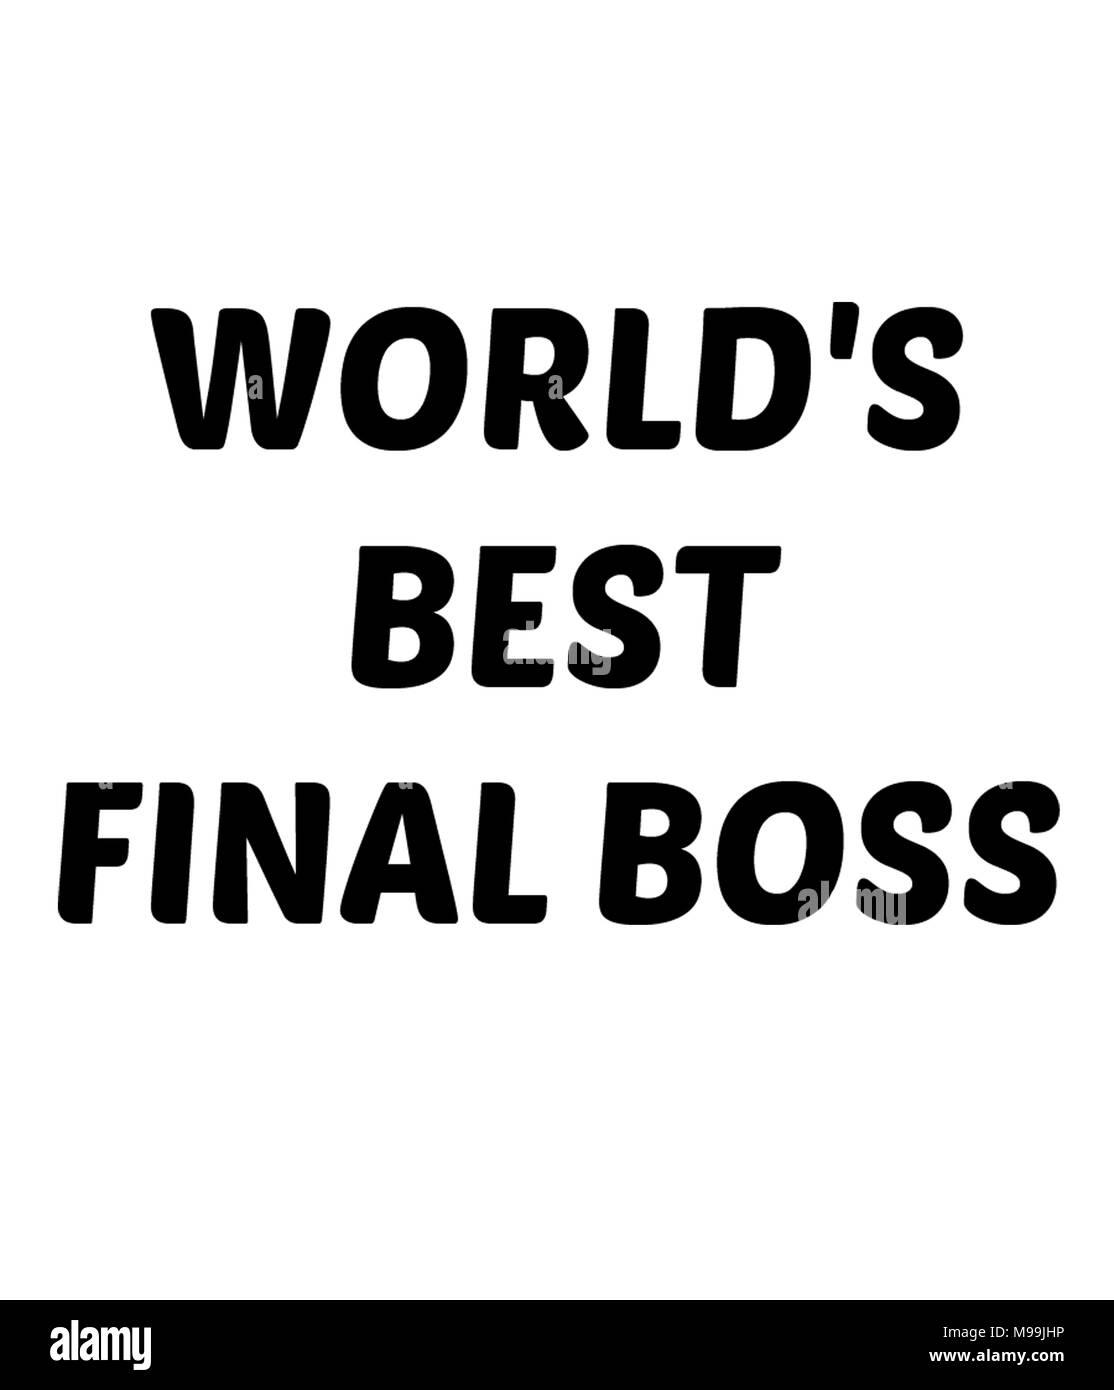 WORLD'S BEST FINAL BOSS - Stock Image